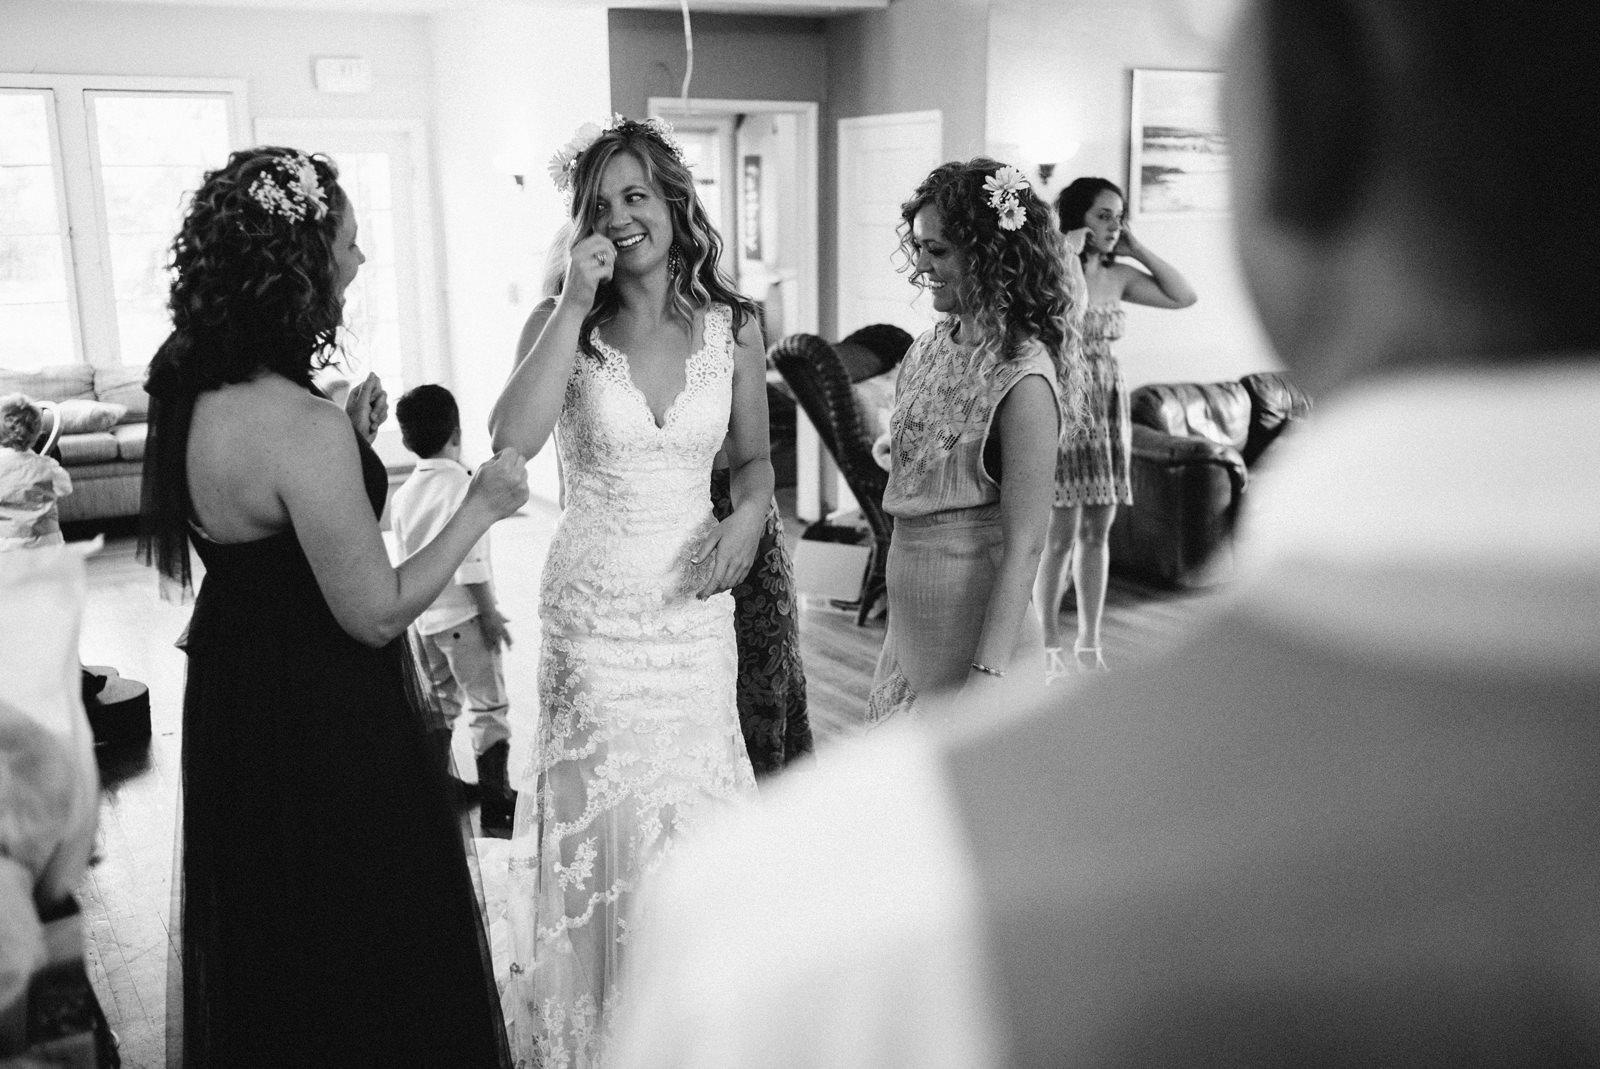 rivers-bend-retreat-wedding-009 RIVER'S BEND RETREAT WEDDING